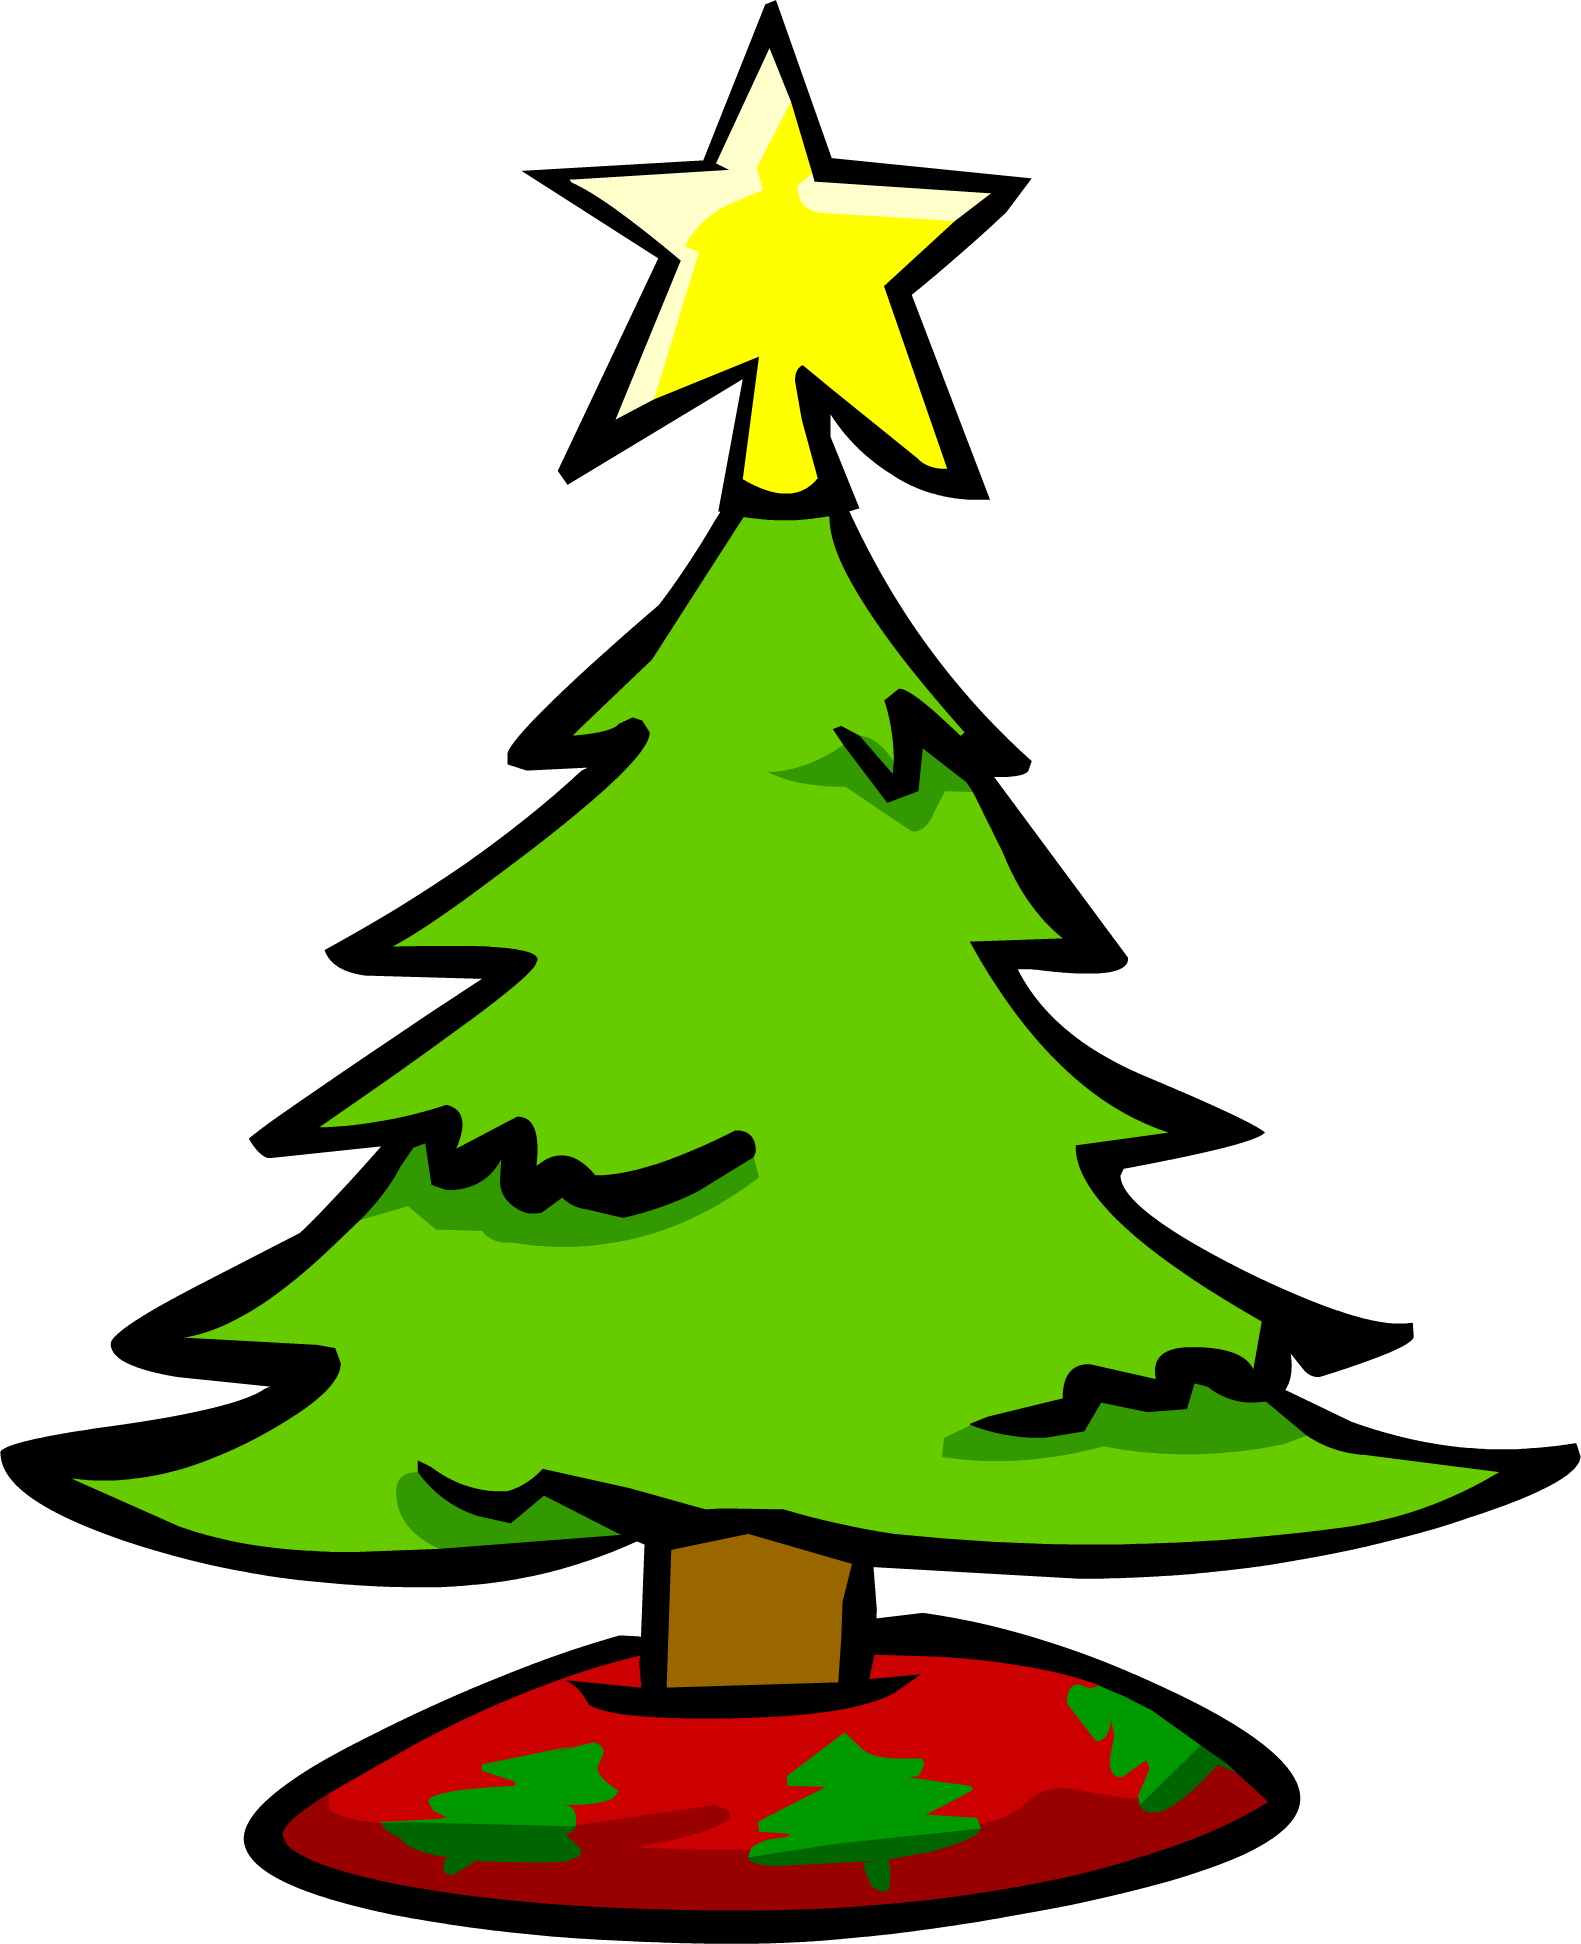 small christmas tree - Christmas Tree Wiki